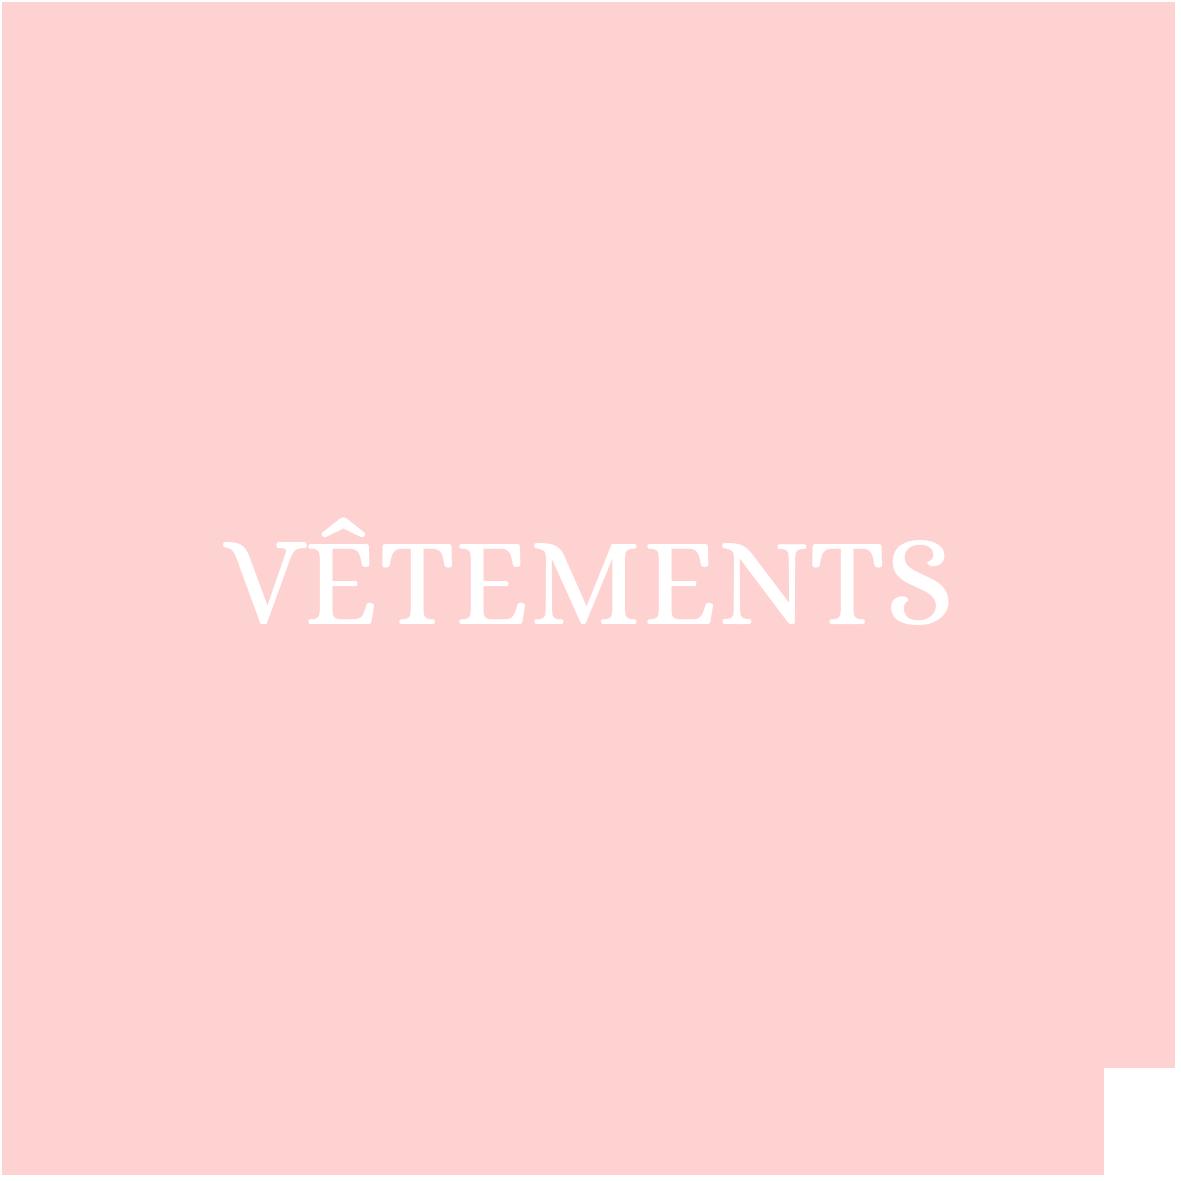 vetements.png